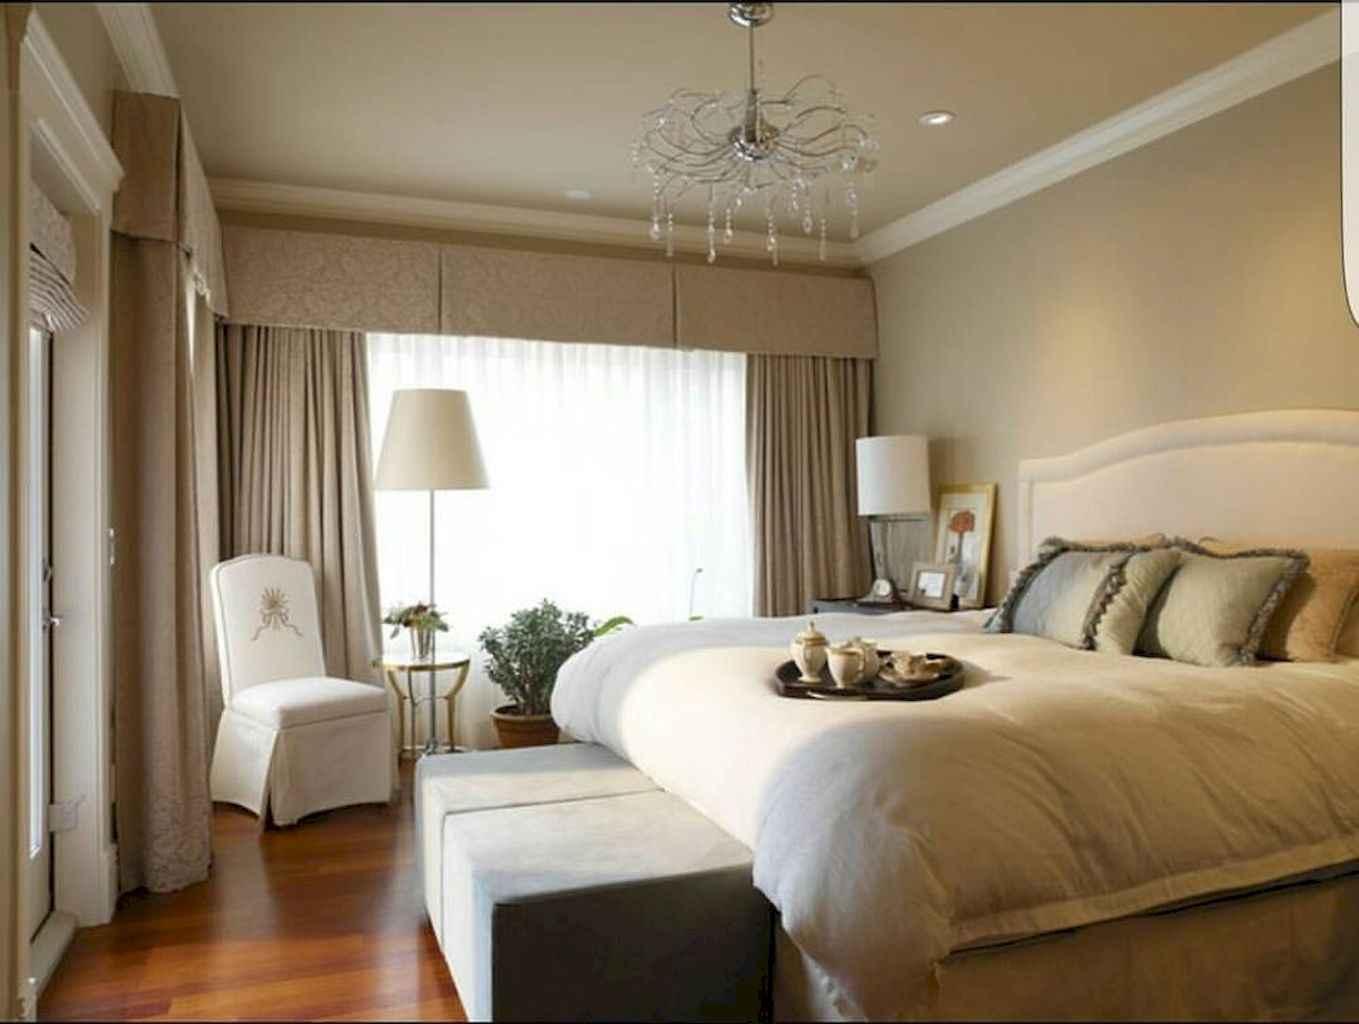 100 Stunning Farmhouse Master Bedroom Decor Ideas (71)